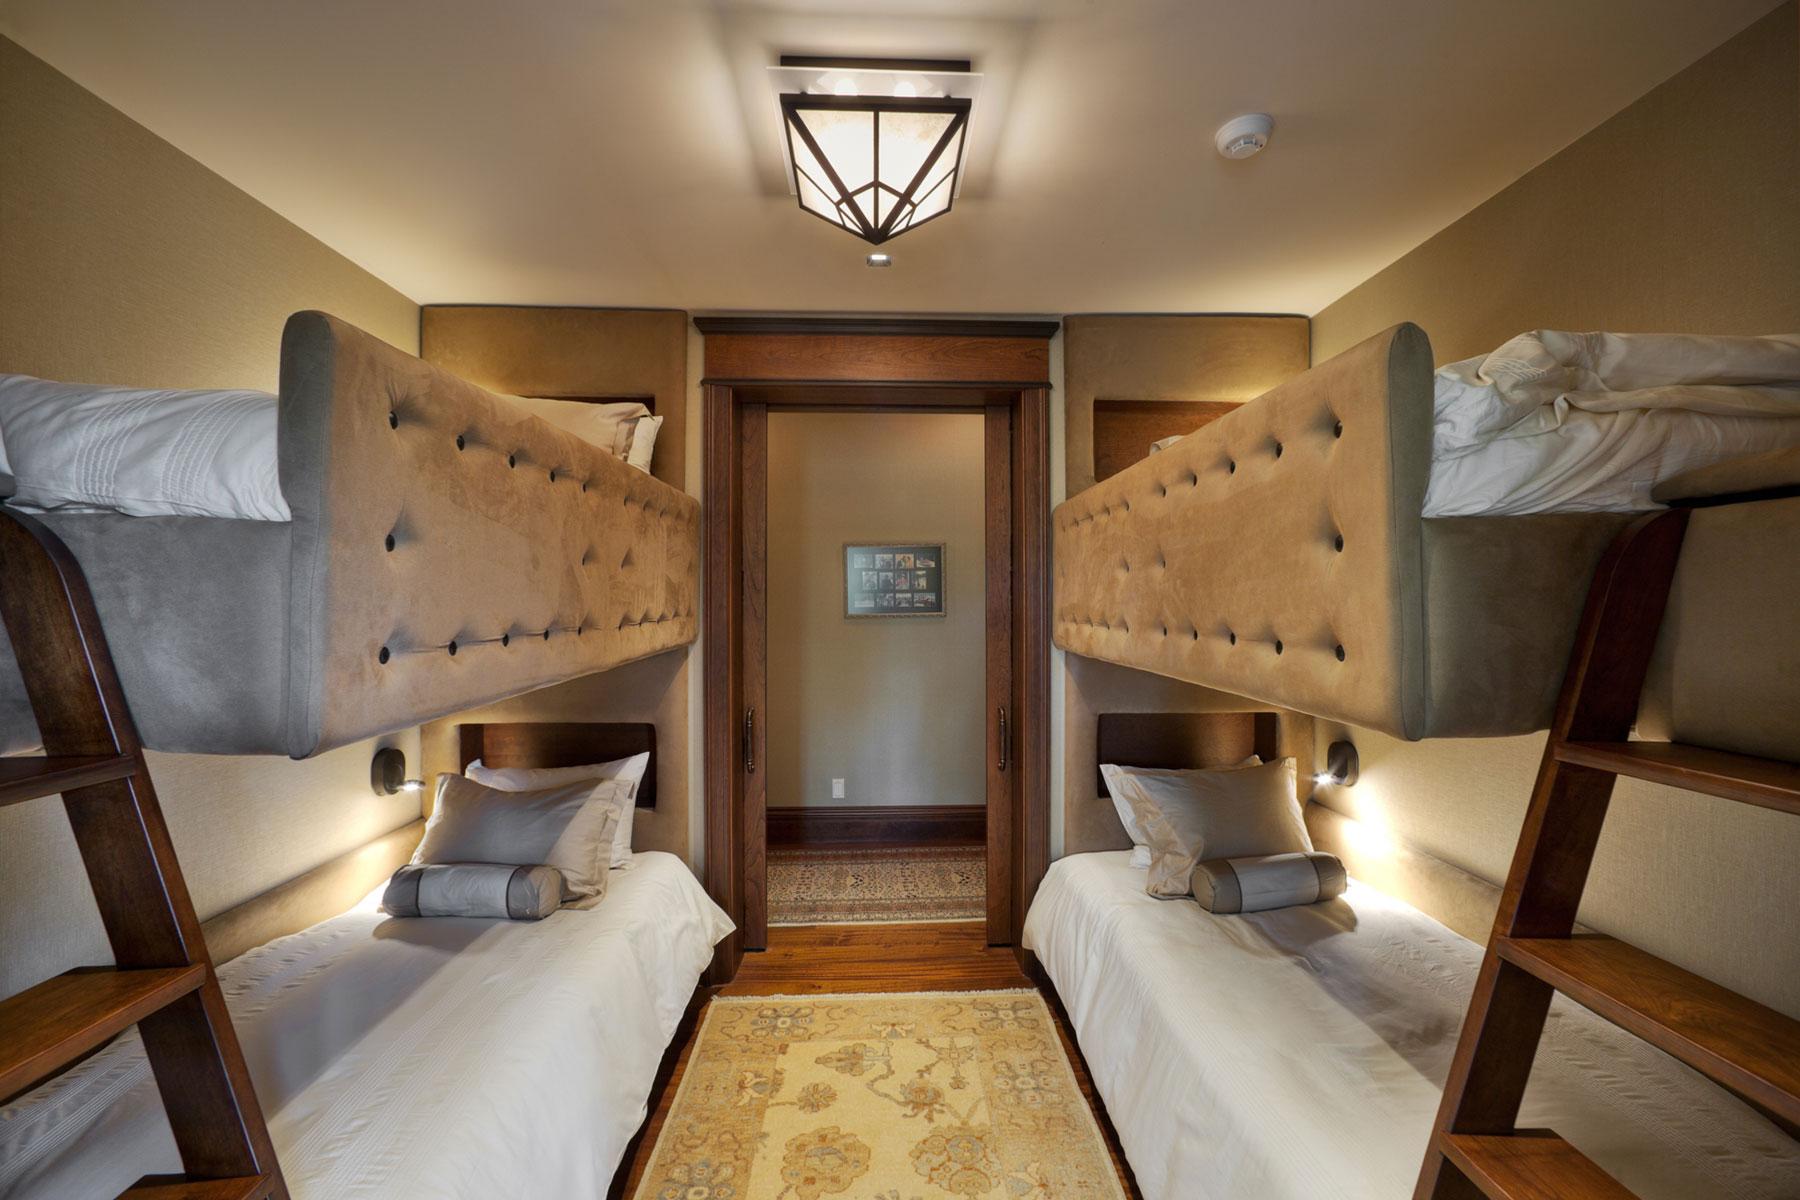 bunk-room-mountain-cabin-asheville-guest-house